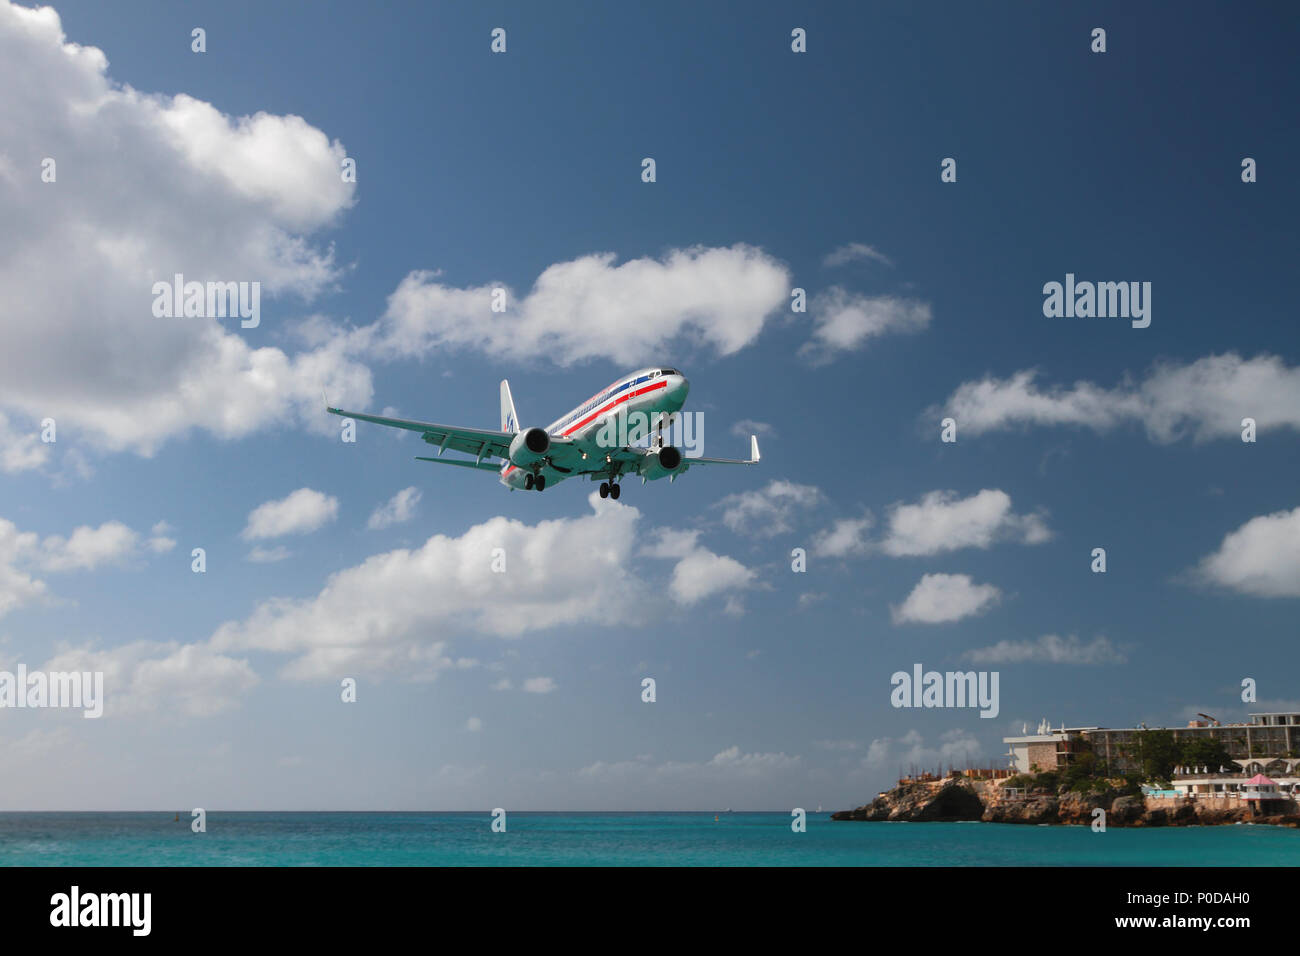 Philipsburg, Saint-Martin - Jan 05, 2015: avión de pasajeros realiza aterrizaje isla tropical Foto de stock